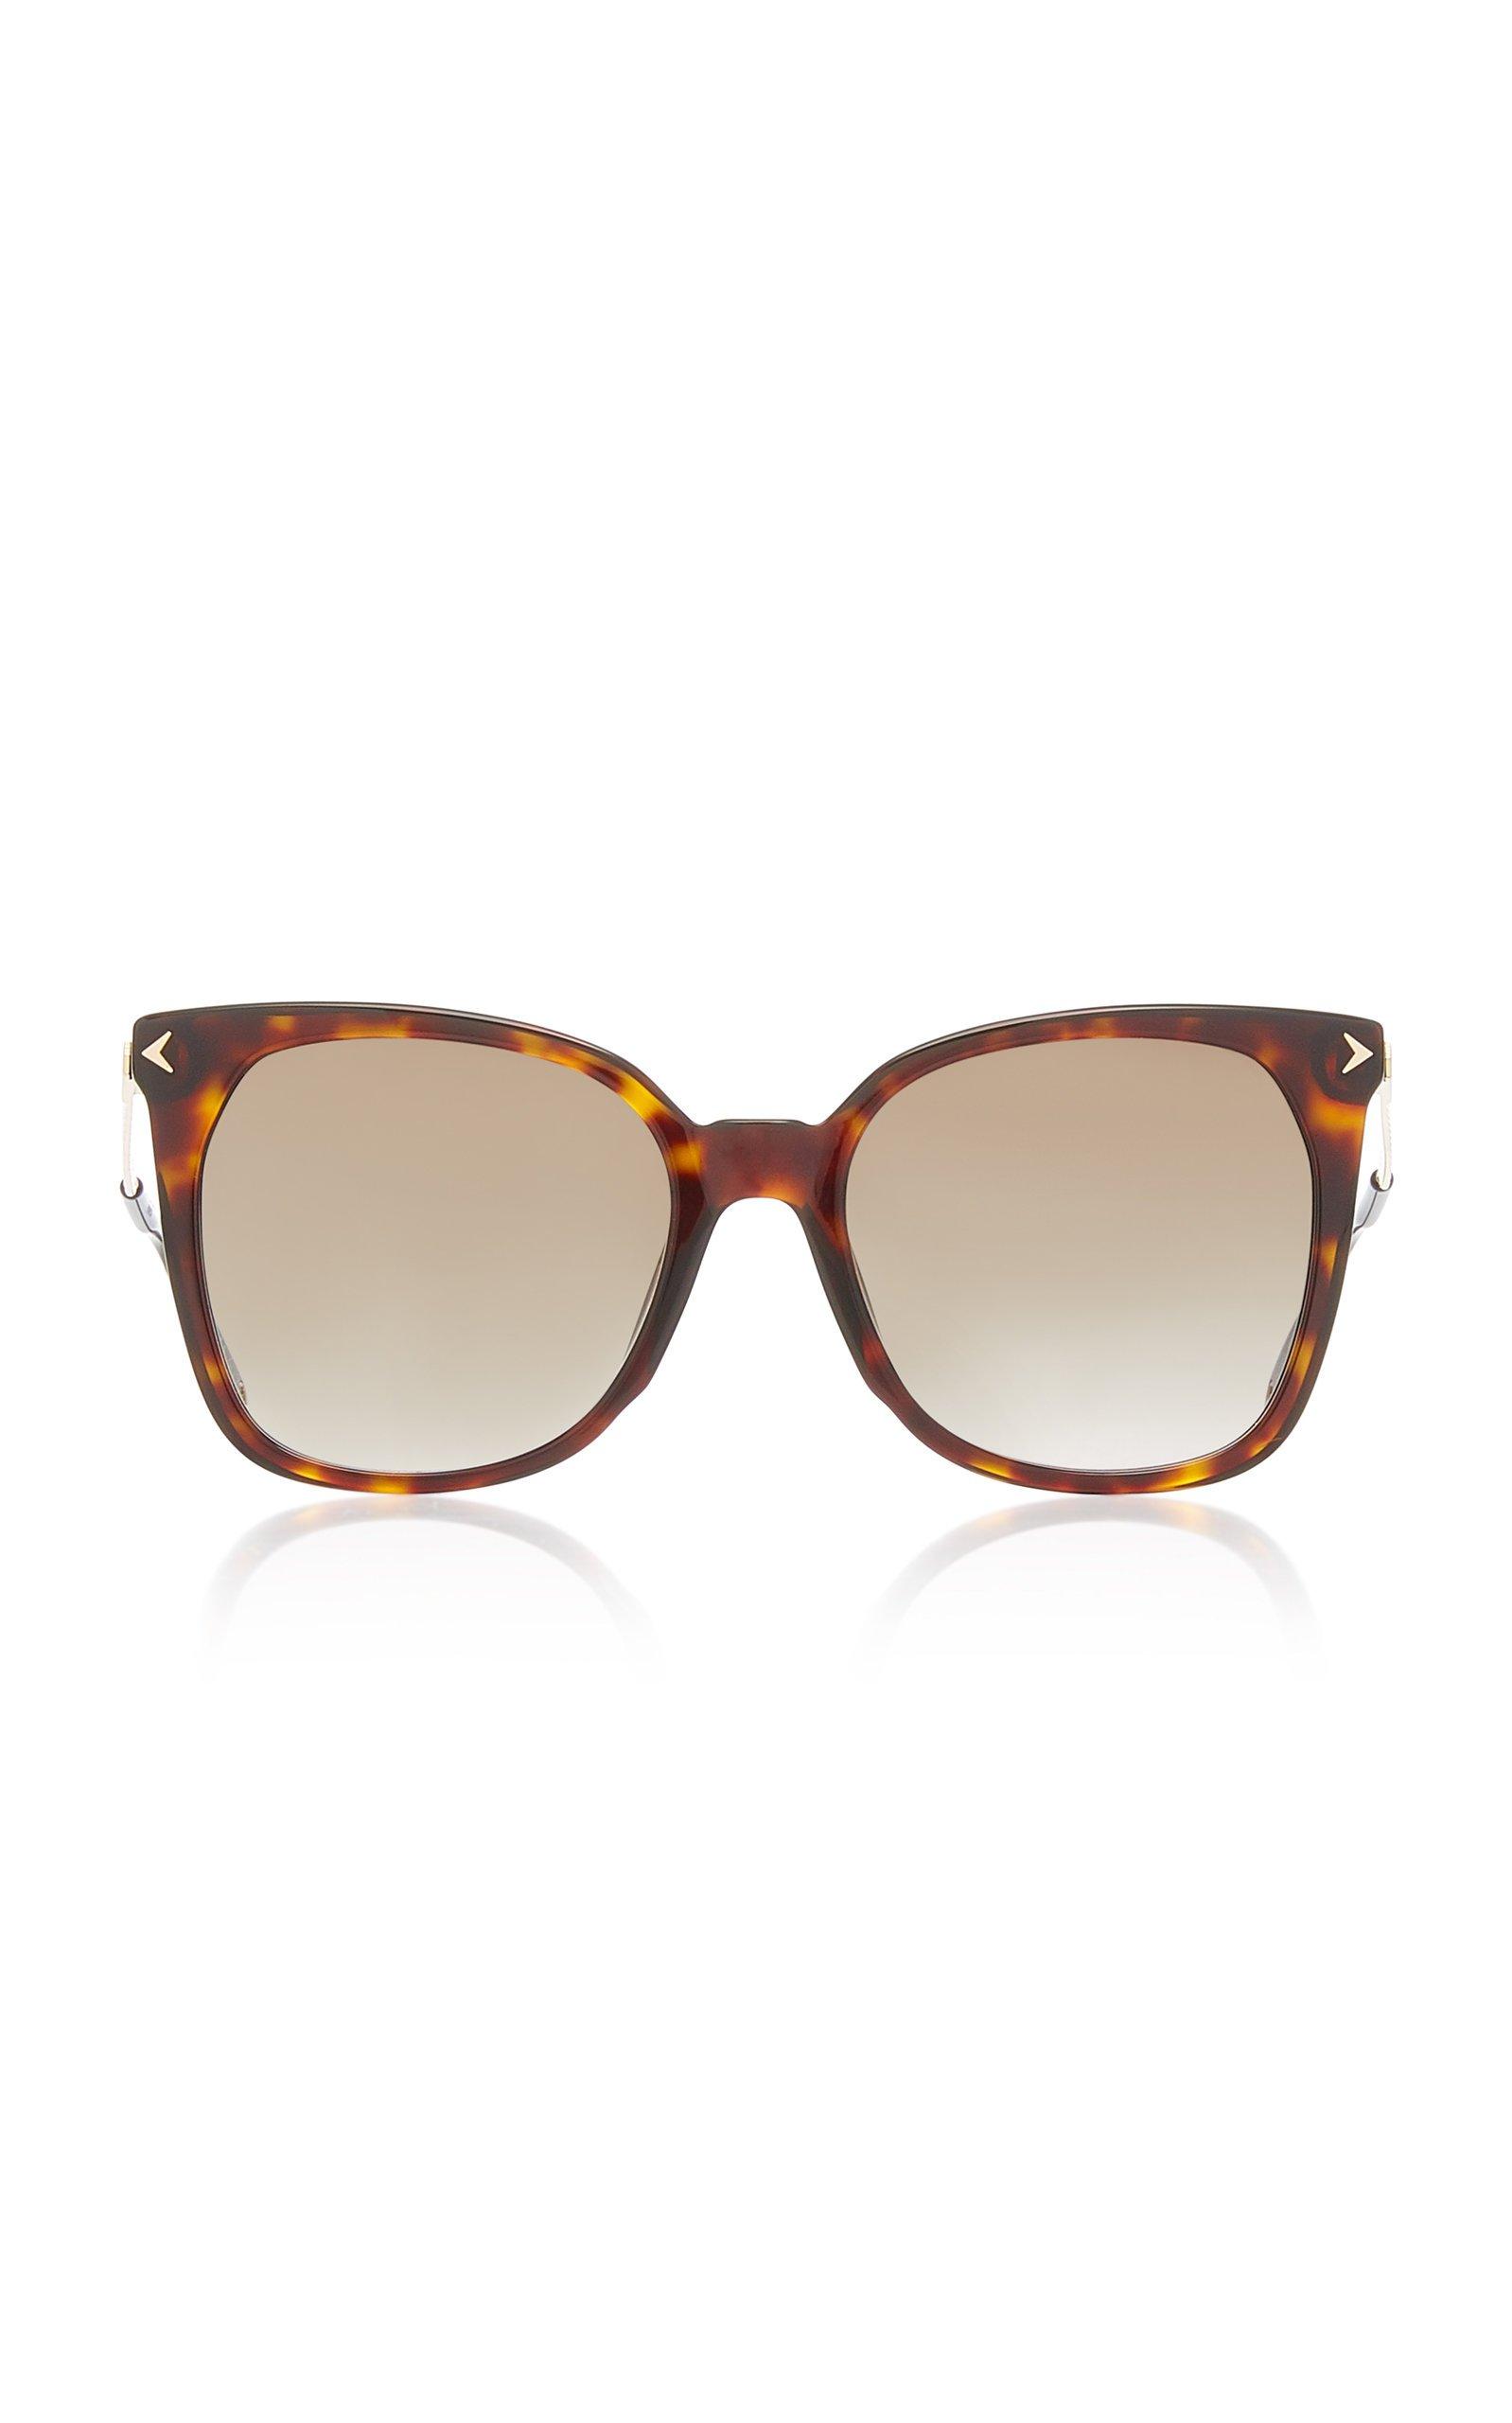 Givenchy Sunglasses Oversized Tortoise Square Sunglasses